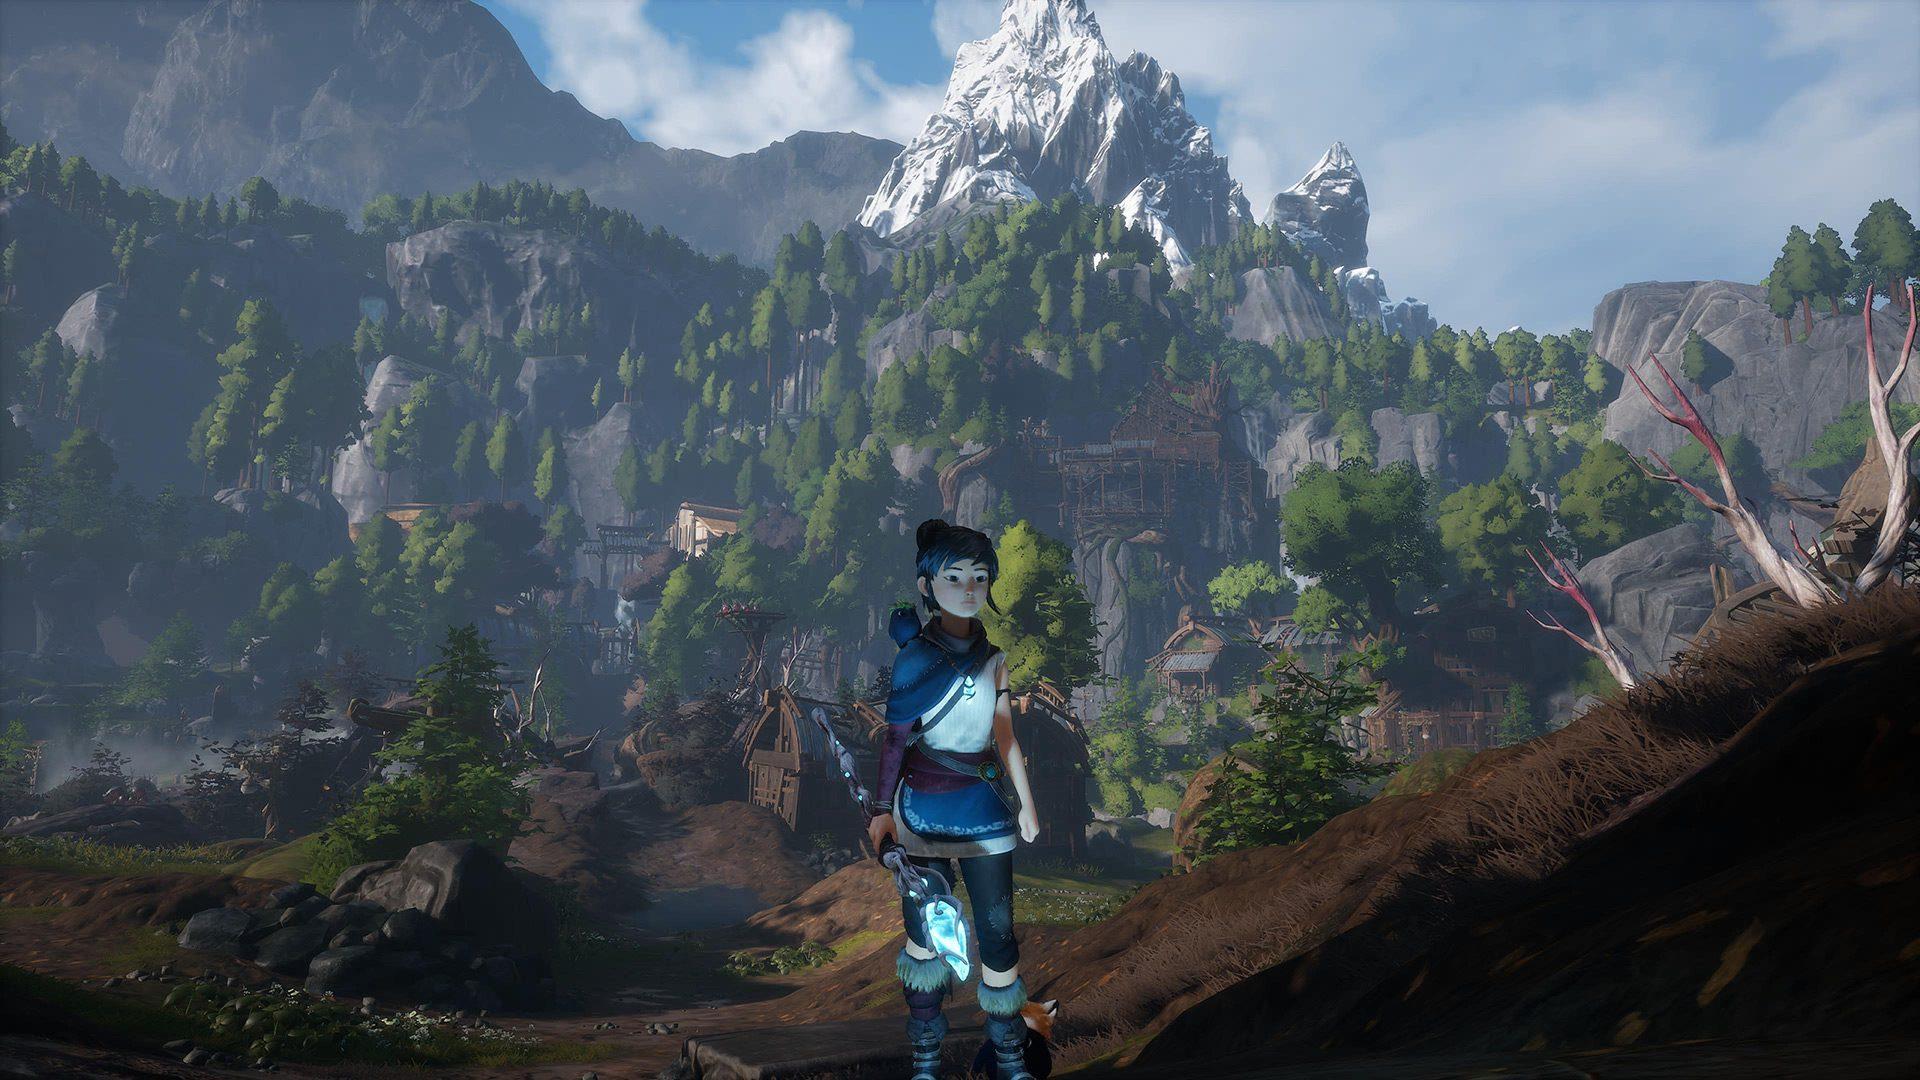 The mountain backdrop in Kena: Bridge of Spirits